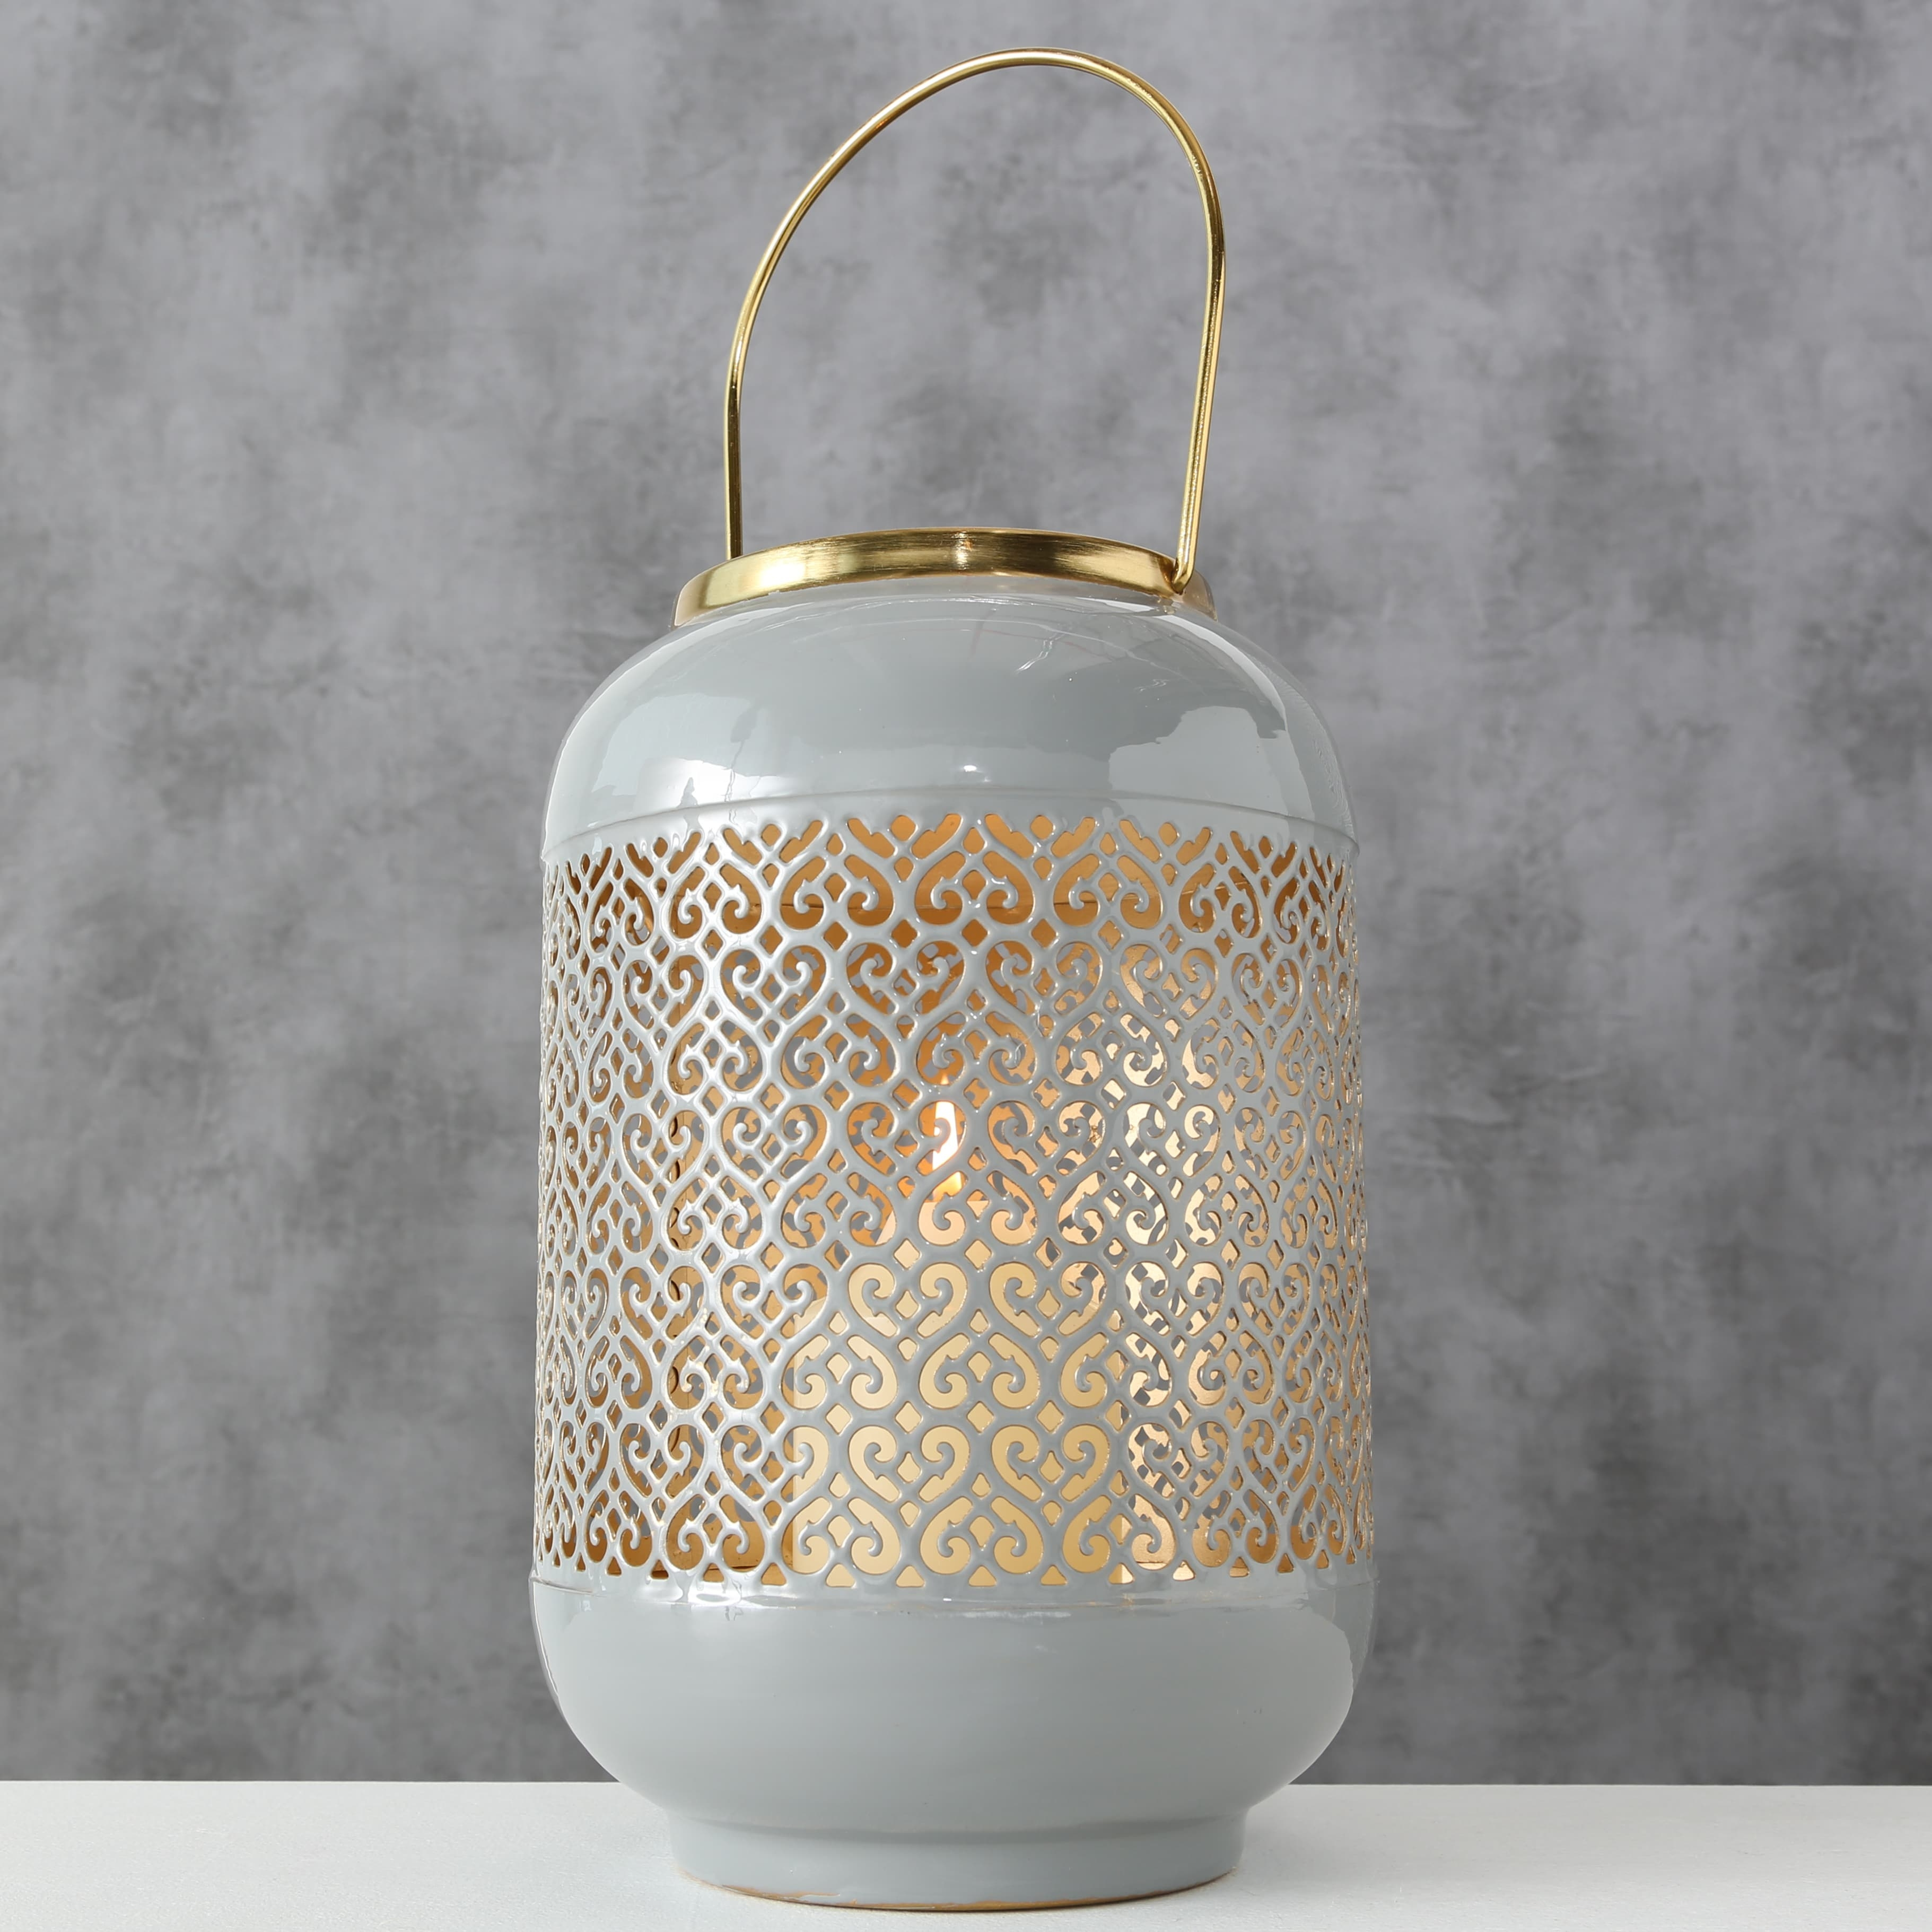 Felinar decorativ din metal Astair Gri / Auriu, Ø18xH27 cm